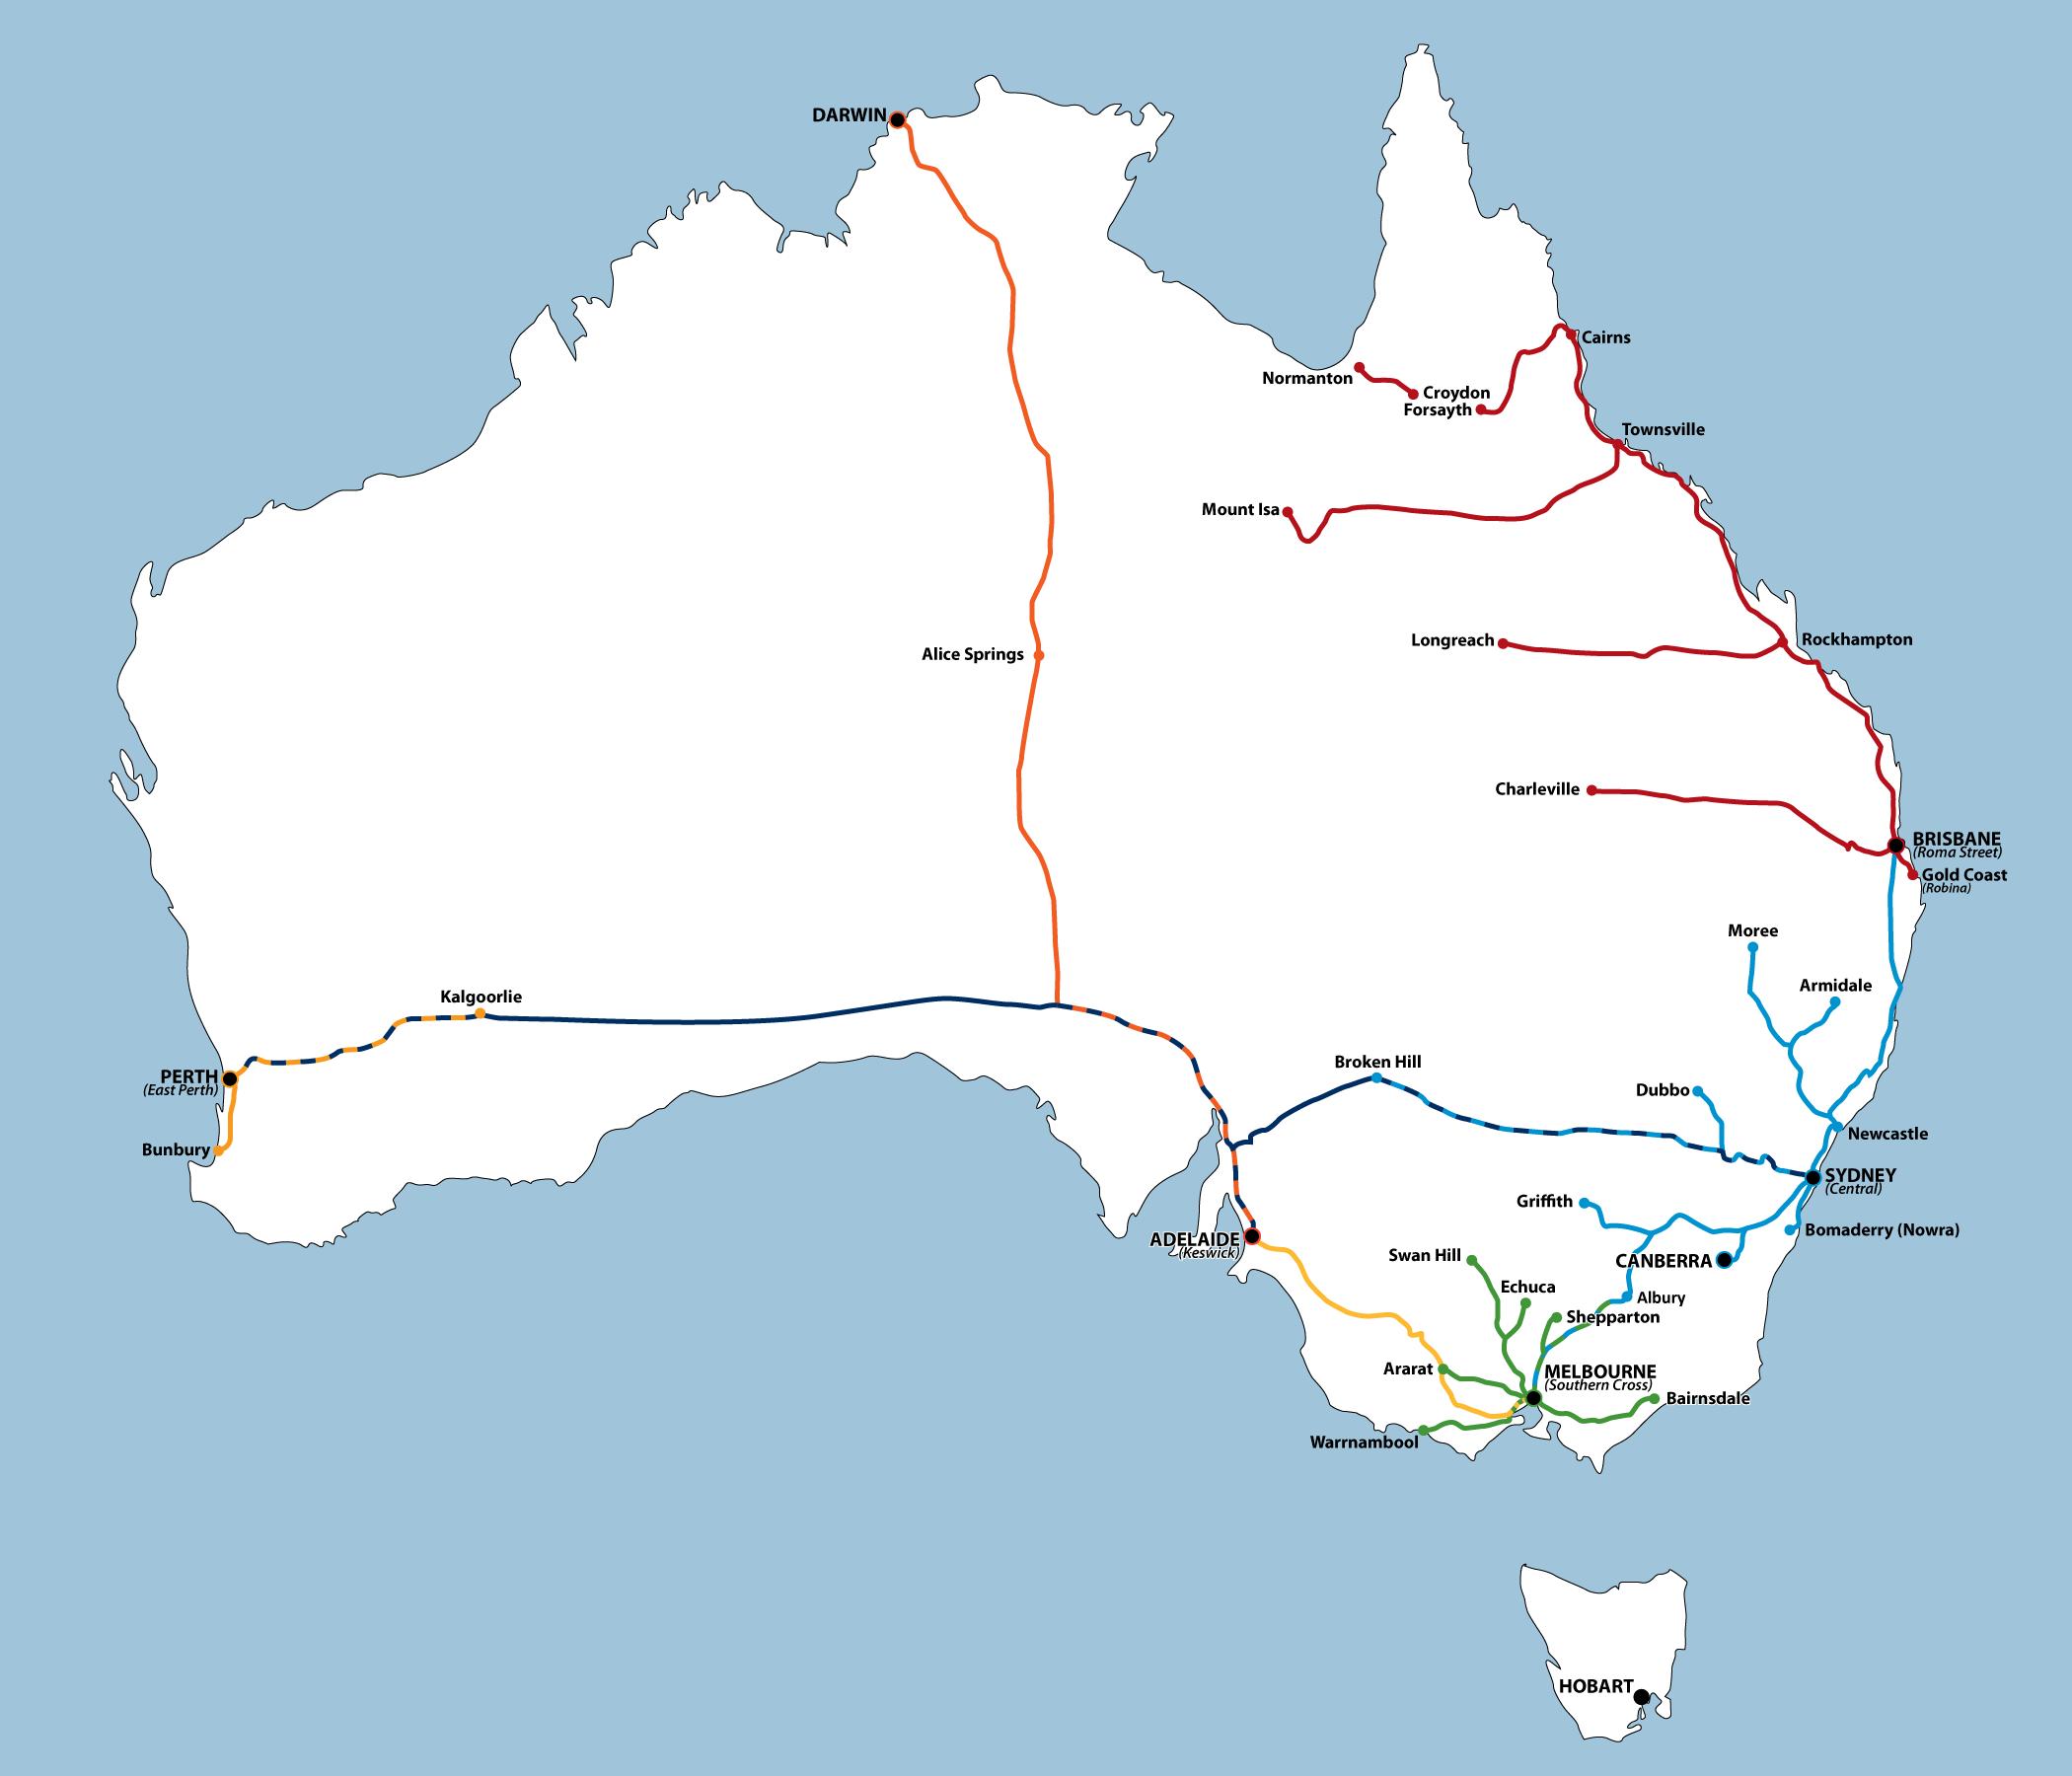 perth rail map australia sydney-#16